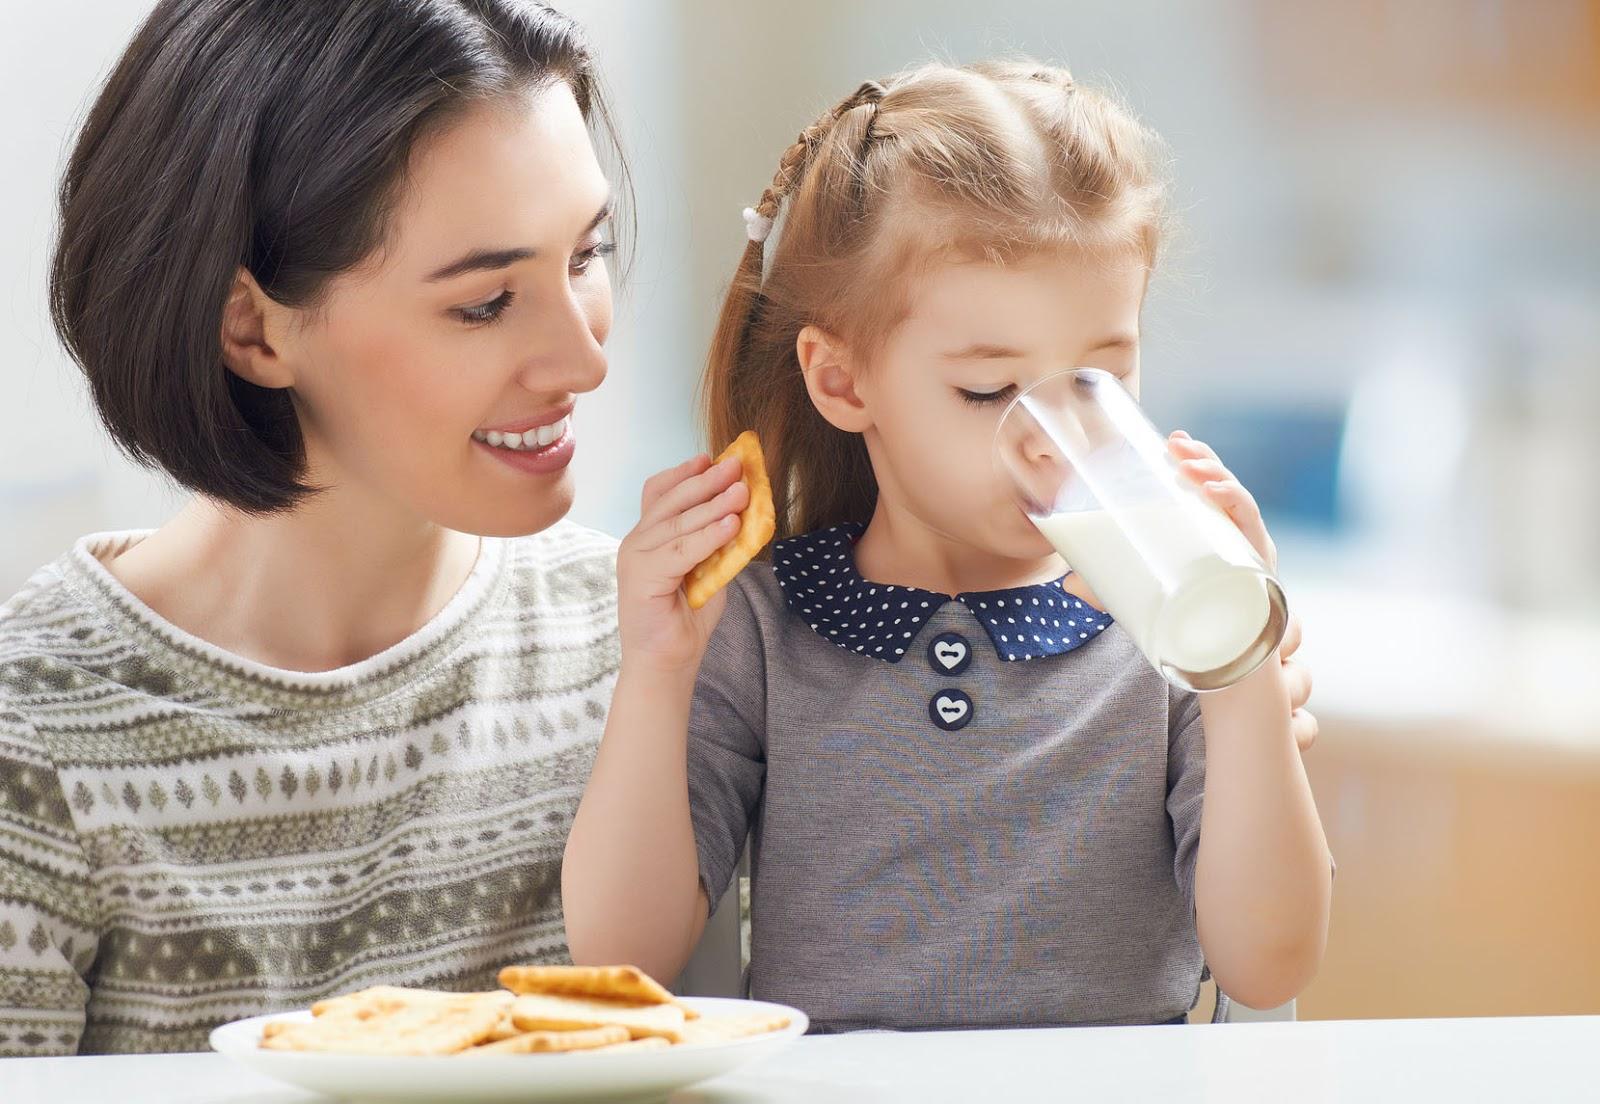 5 Alasan Mengapa Nutrisi Seimbang Penting Bagi Tumbuh Kembang si Kecil